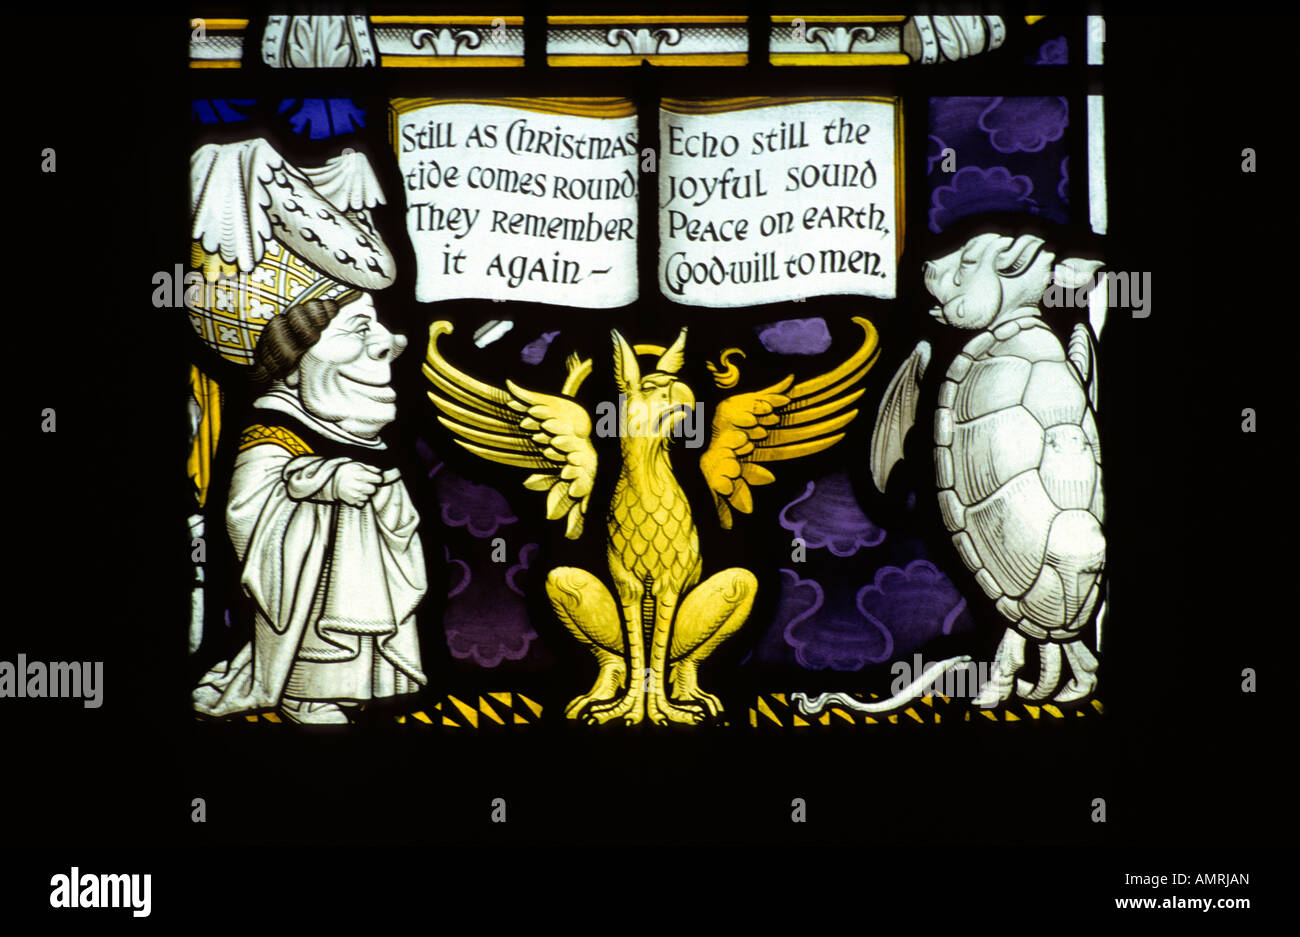 Lewis Carroll stained glass memorial window #4, Daresbury church, Cheshire, UK. - Stock Image